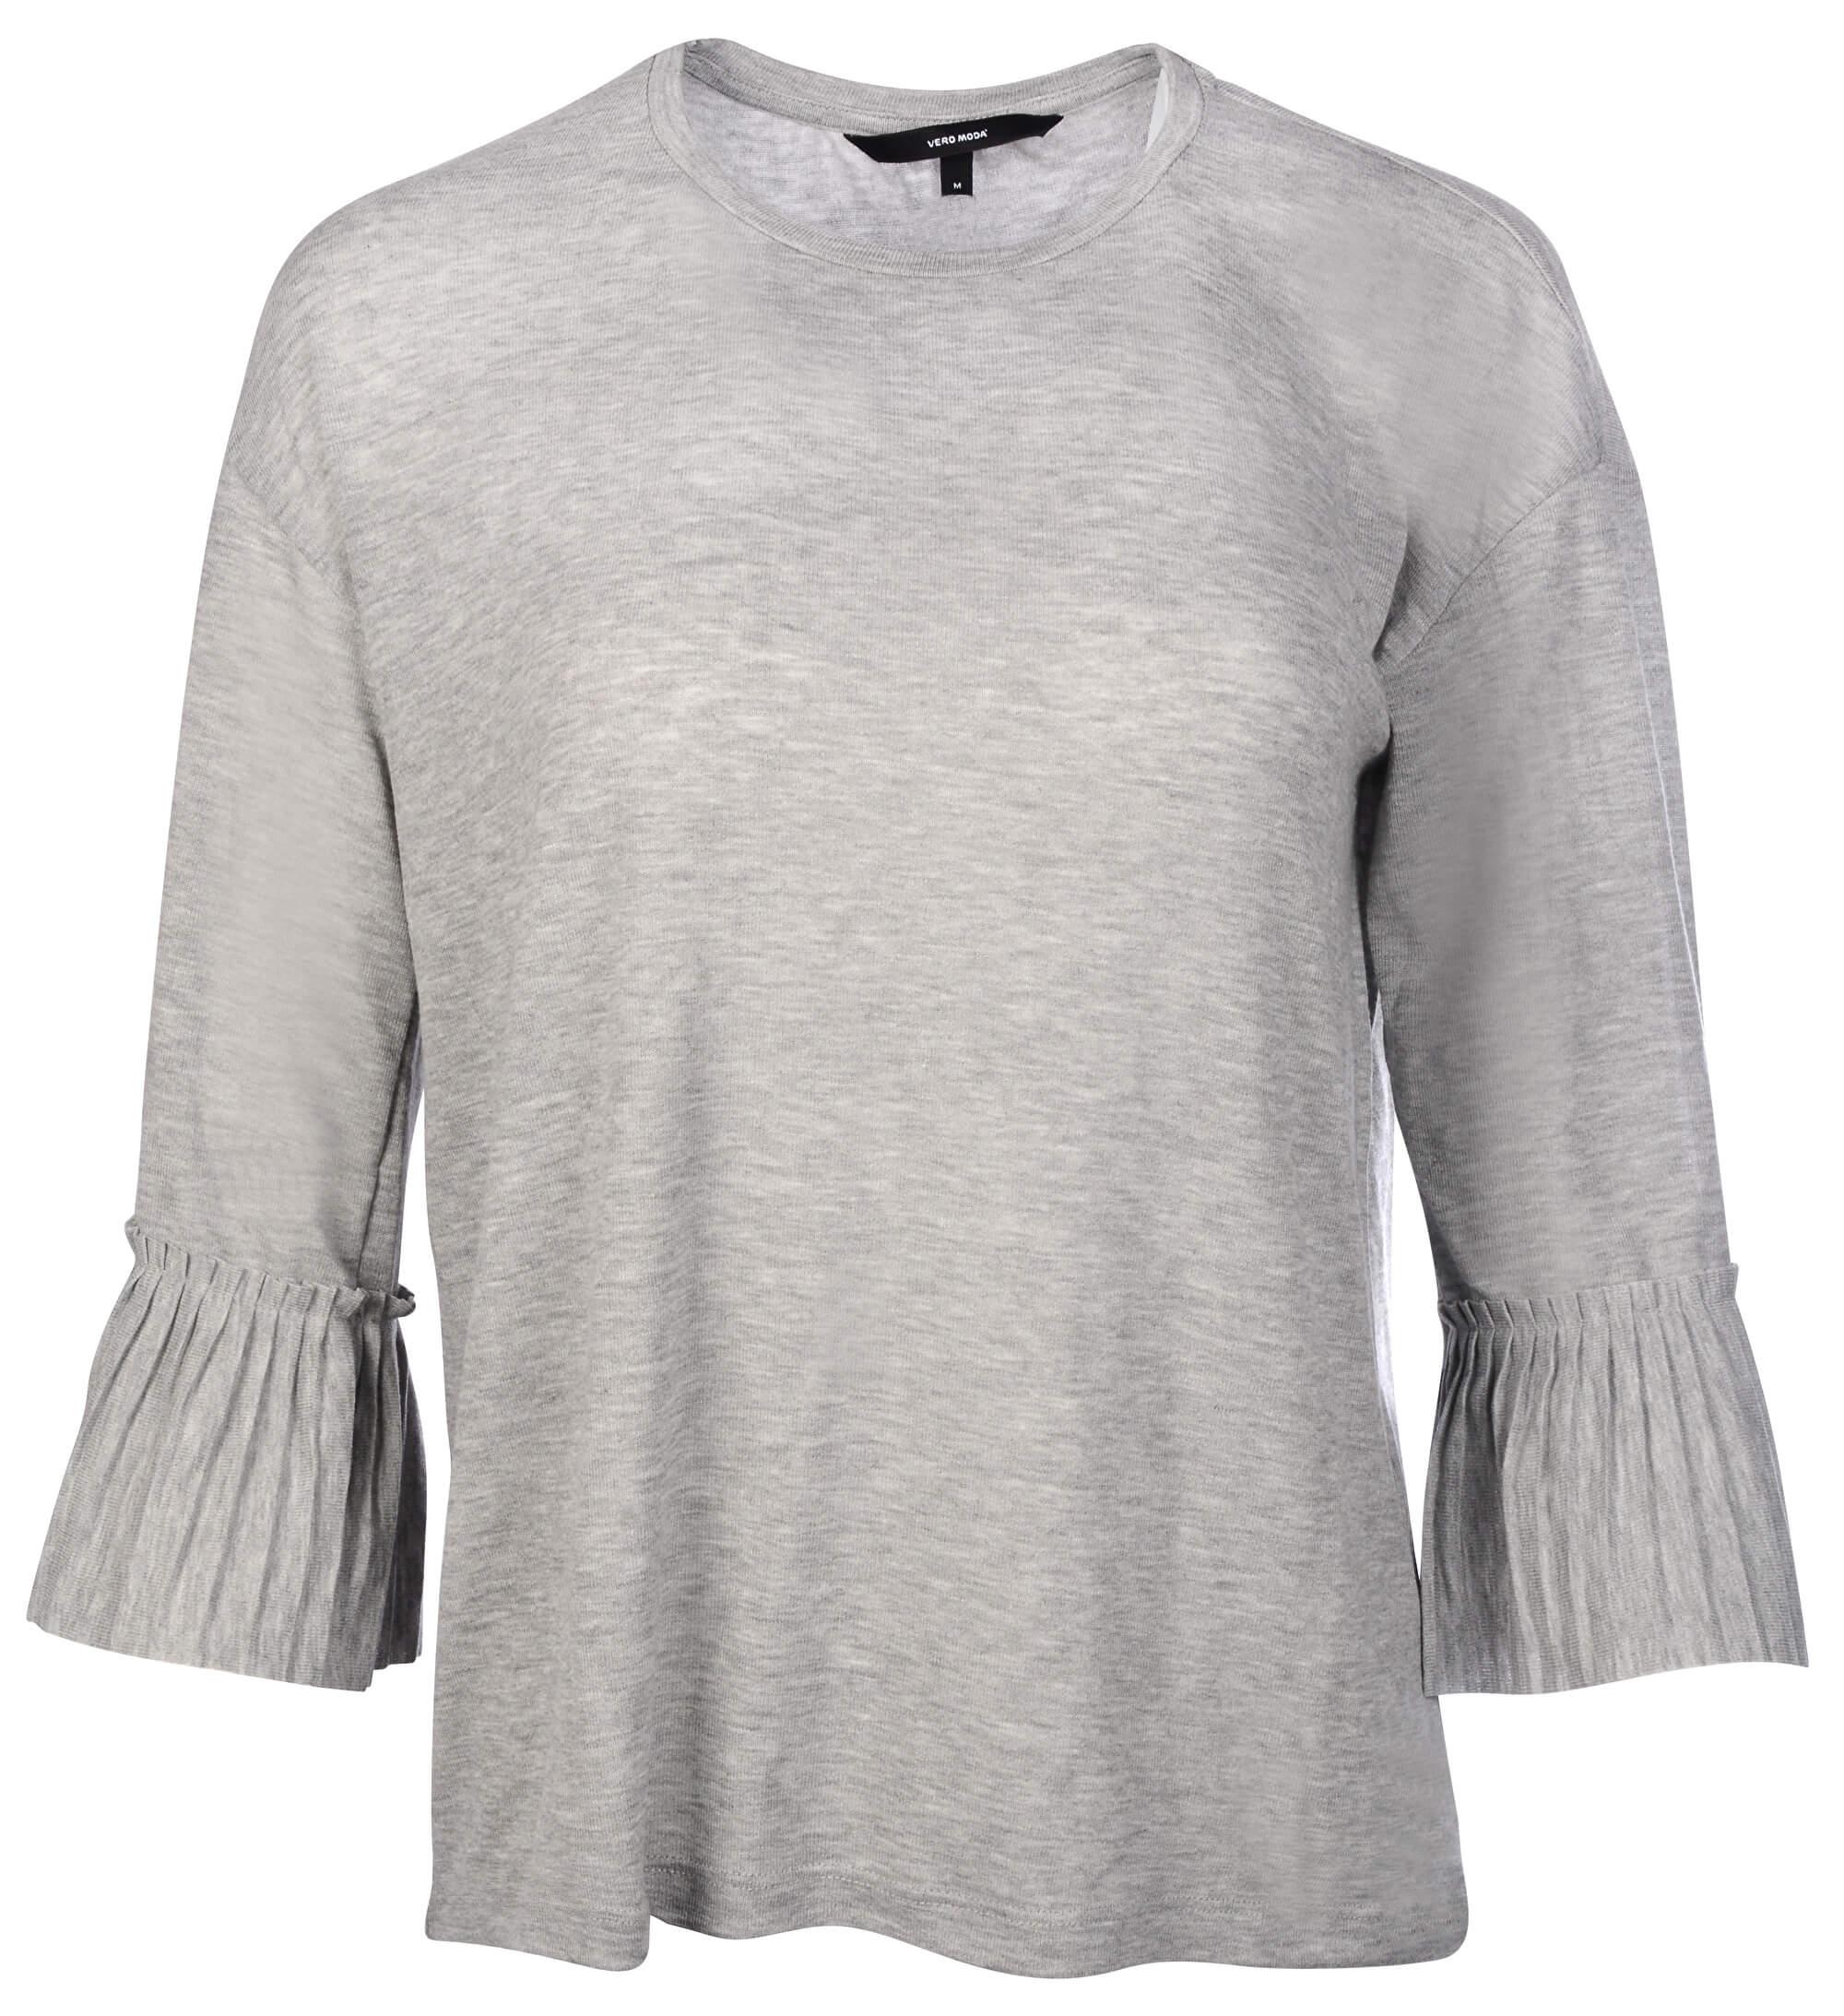 Vero Moda Dámské triko Jakuri 3 4 Cuff Frill Top D2-2 Light Grey Melange  Melange bdbdb9c60a